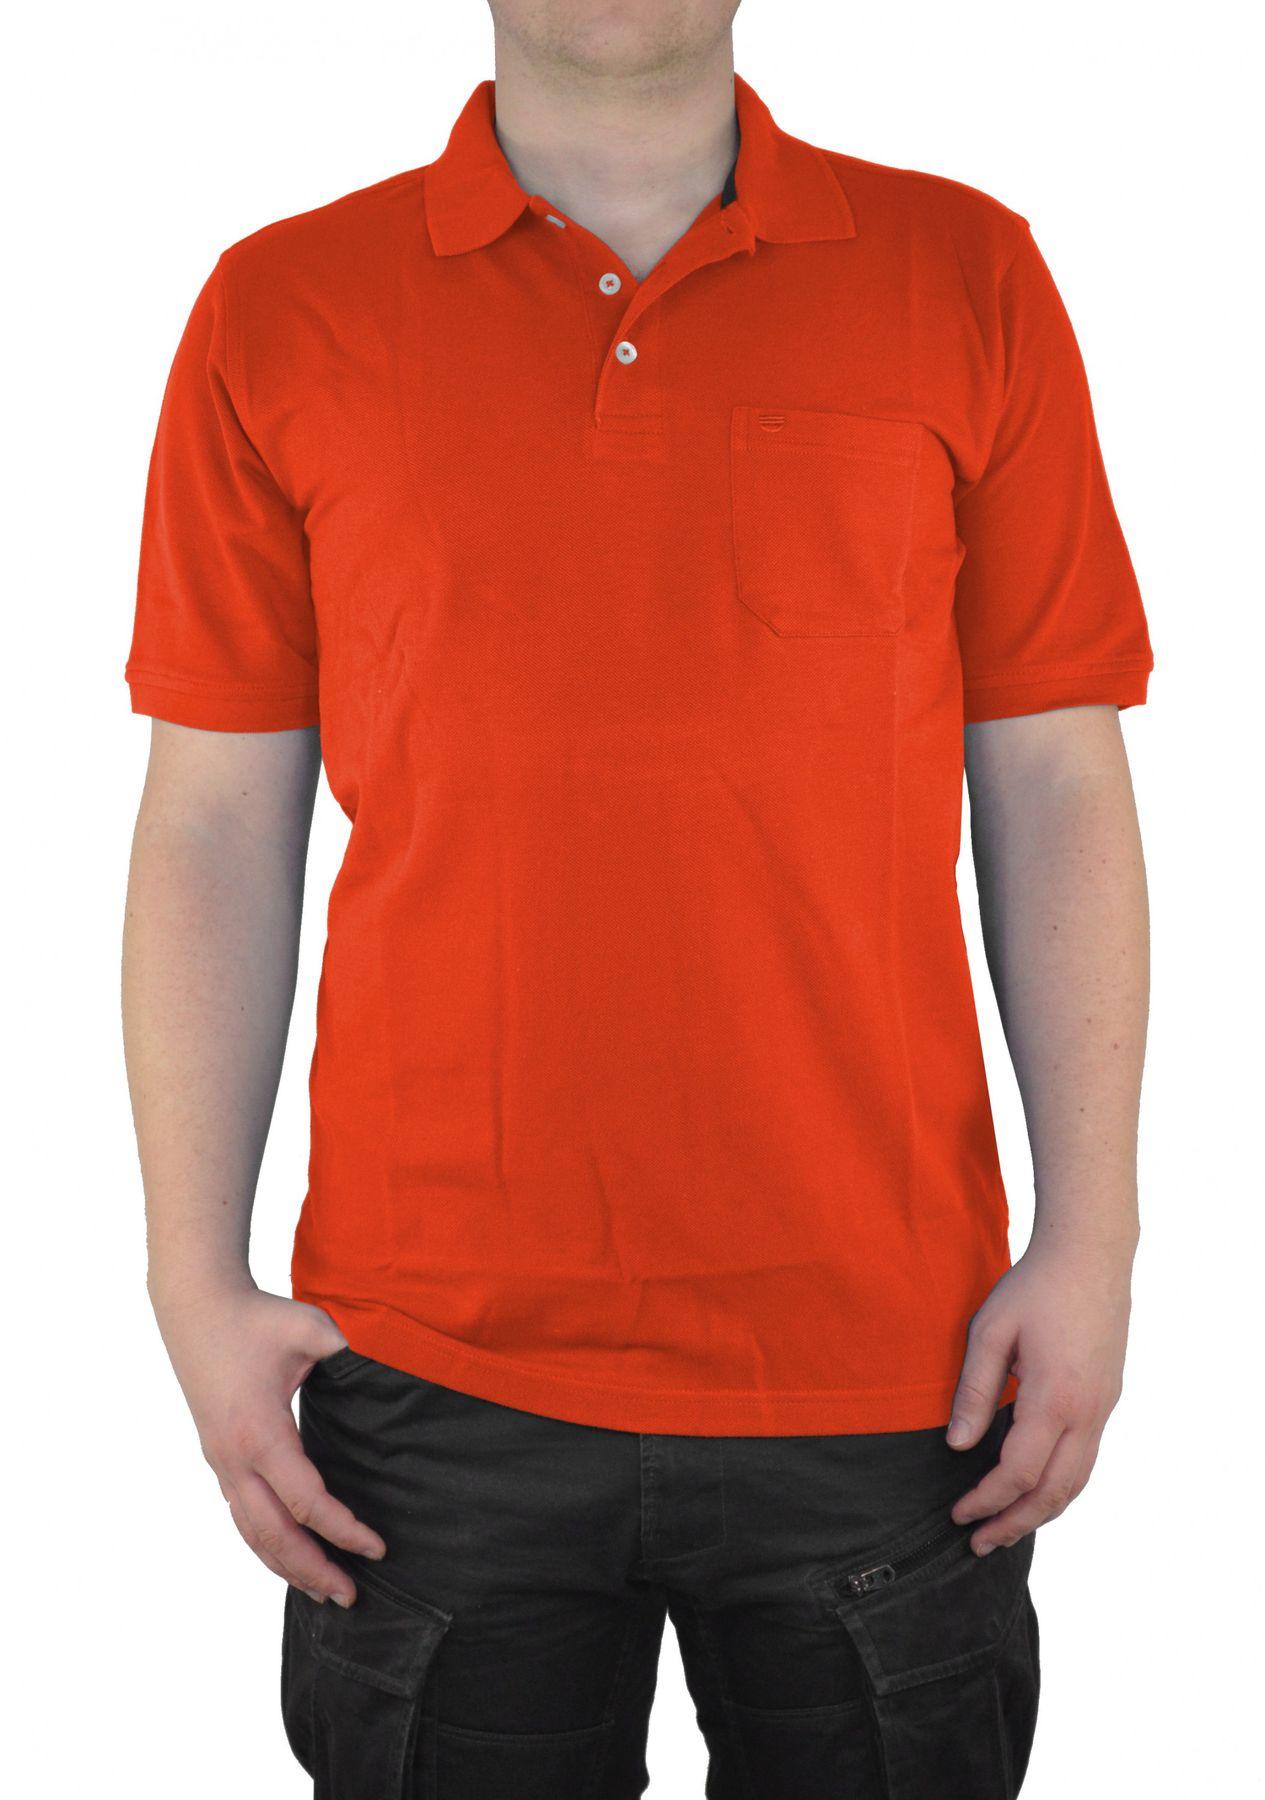 Redmond - Regular Fit - Herren Polo Shirt in verschiedenen Farben (900 A) – Bild 11